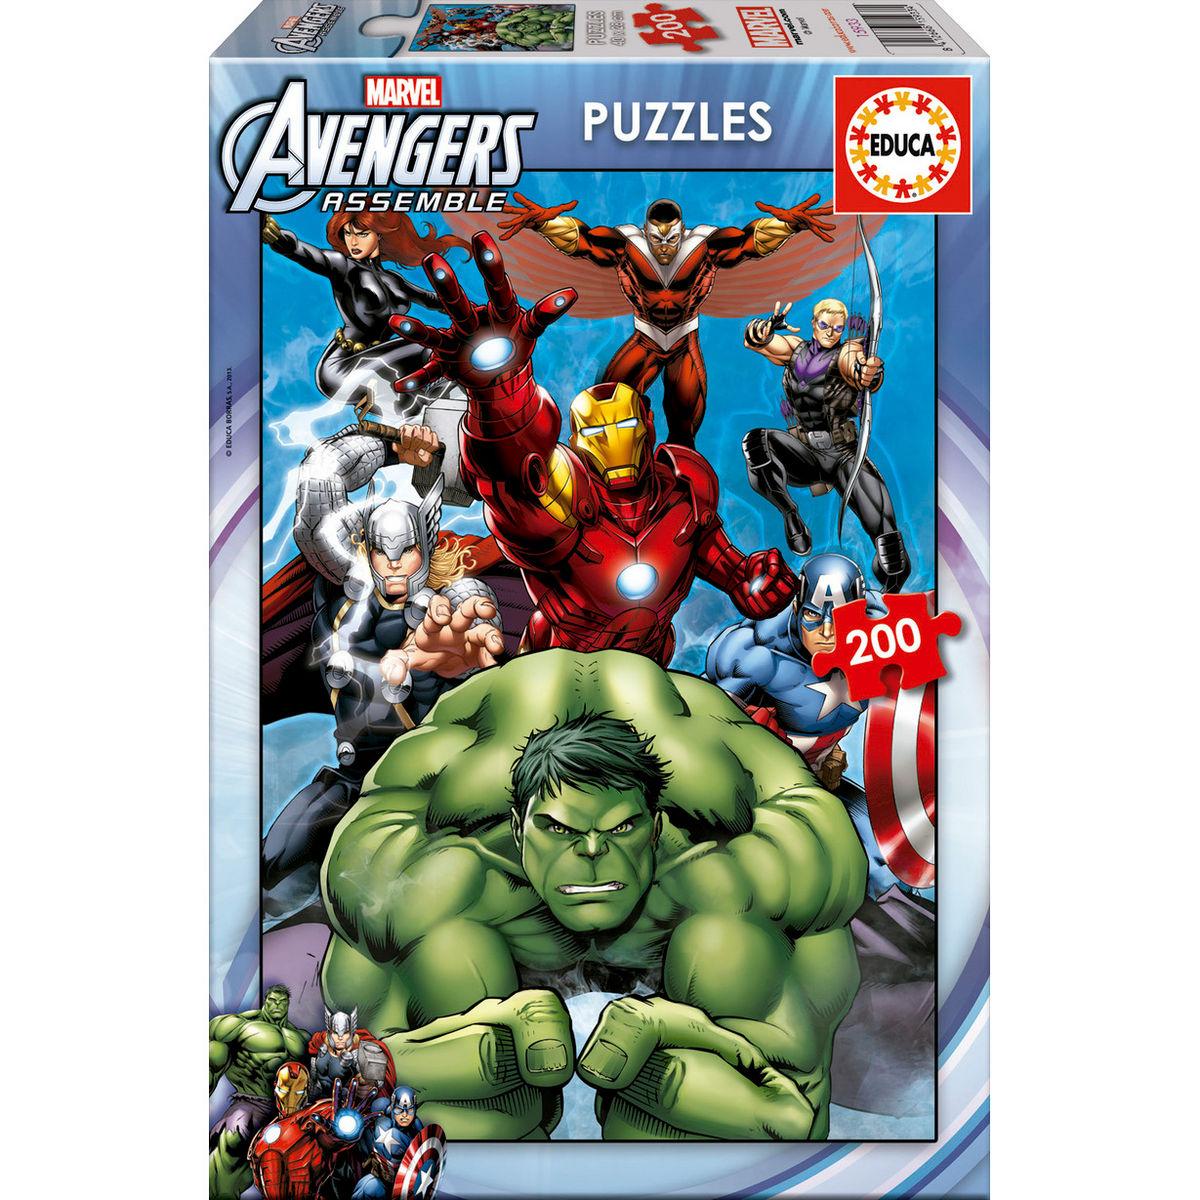 ✅Comprar Puzzle Vengadores Avengers Marvel 200 - Dibujos para colorear